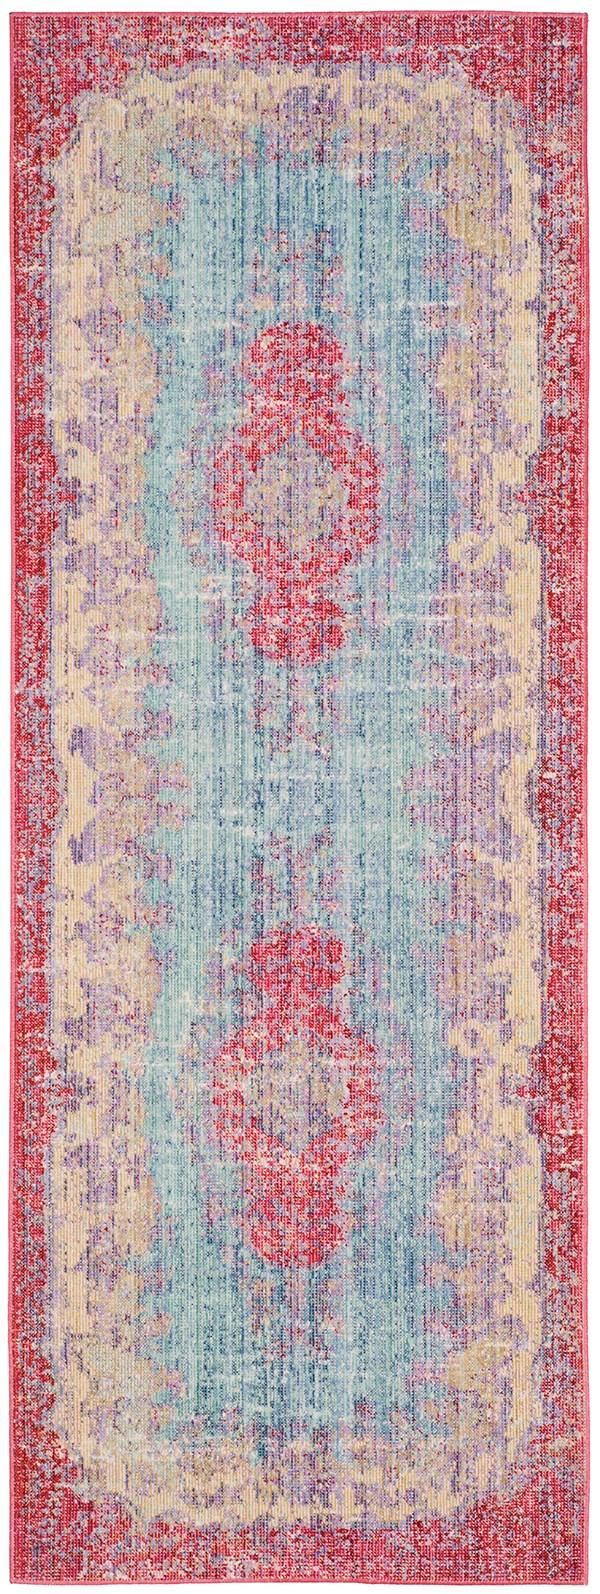 Light Blue, Fuchsia (A) Vintage / Overdyed Area Rug